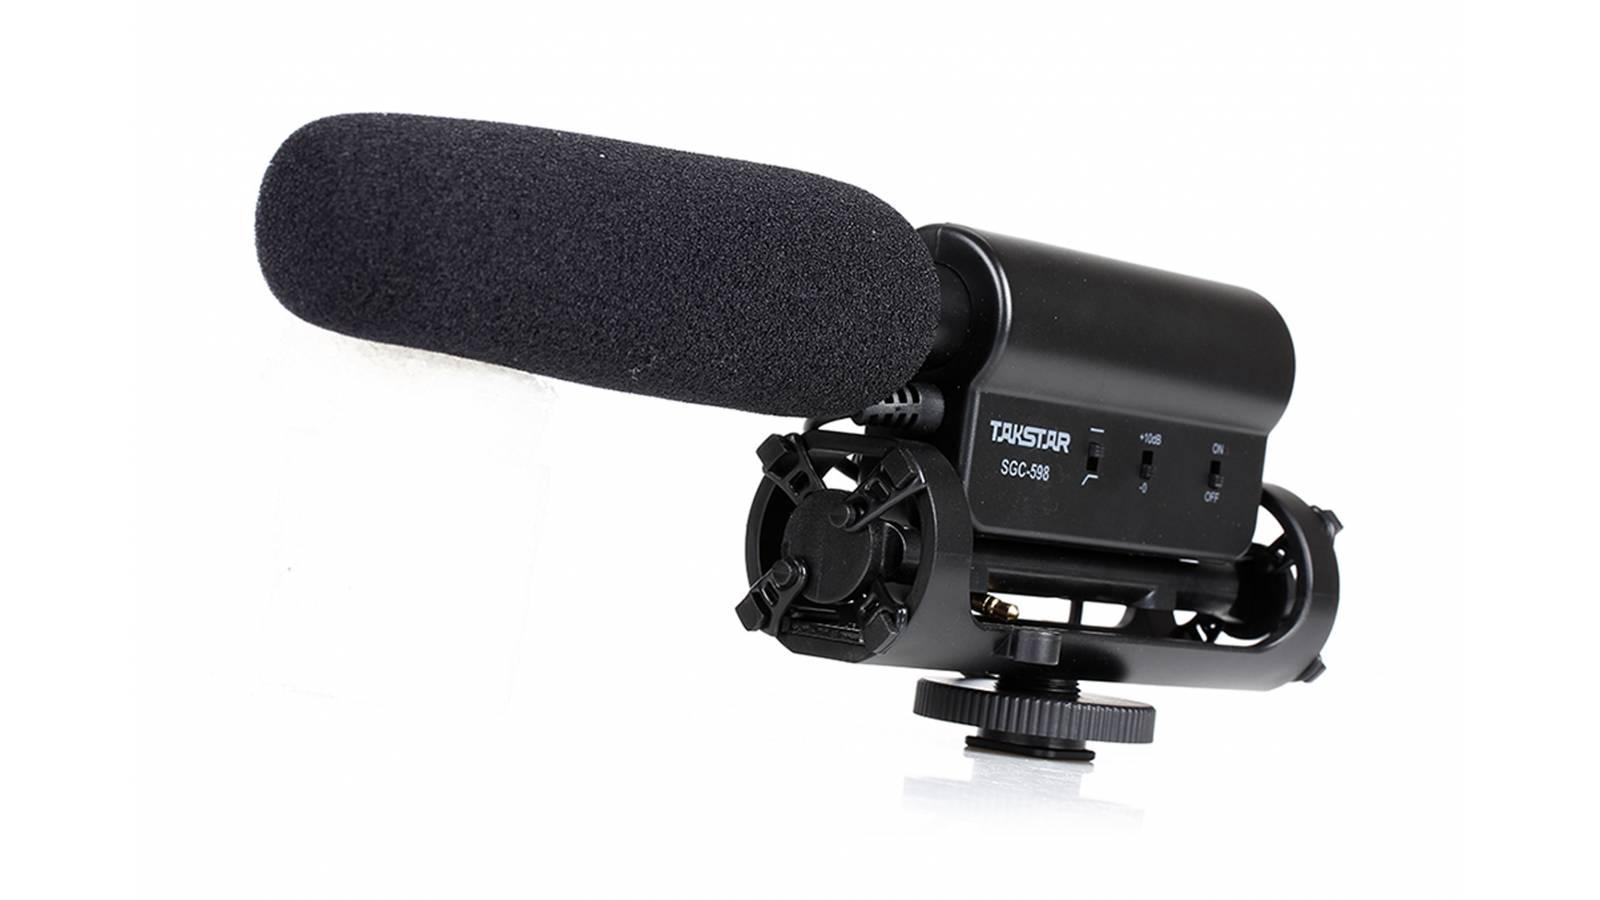 Microfono para Camaras Reflex Takstar SGC-598